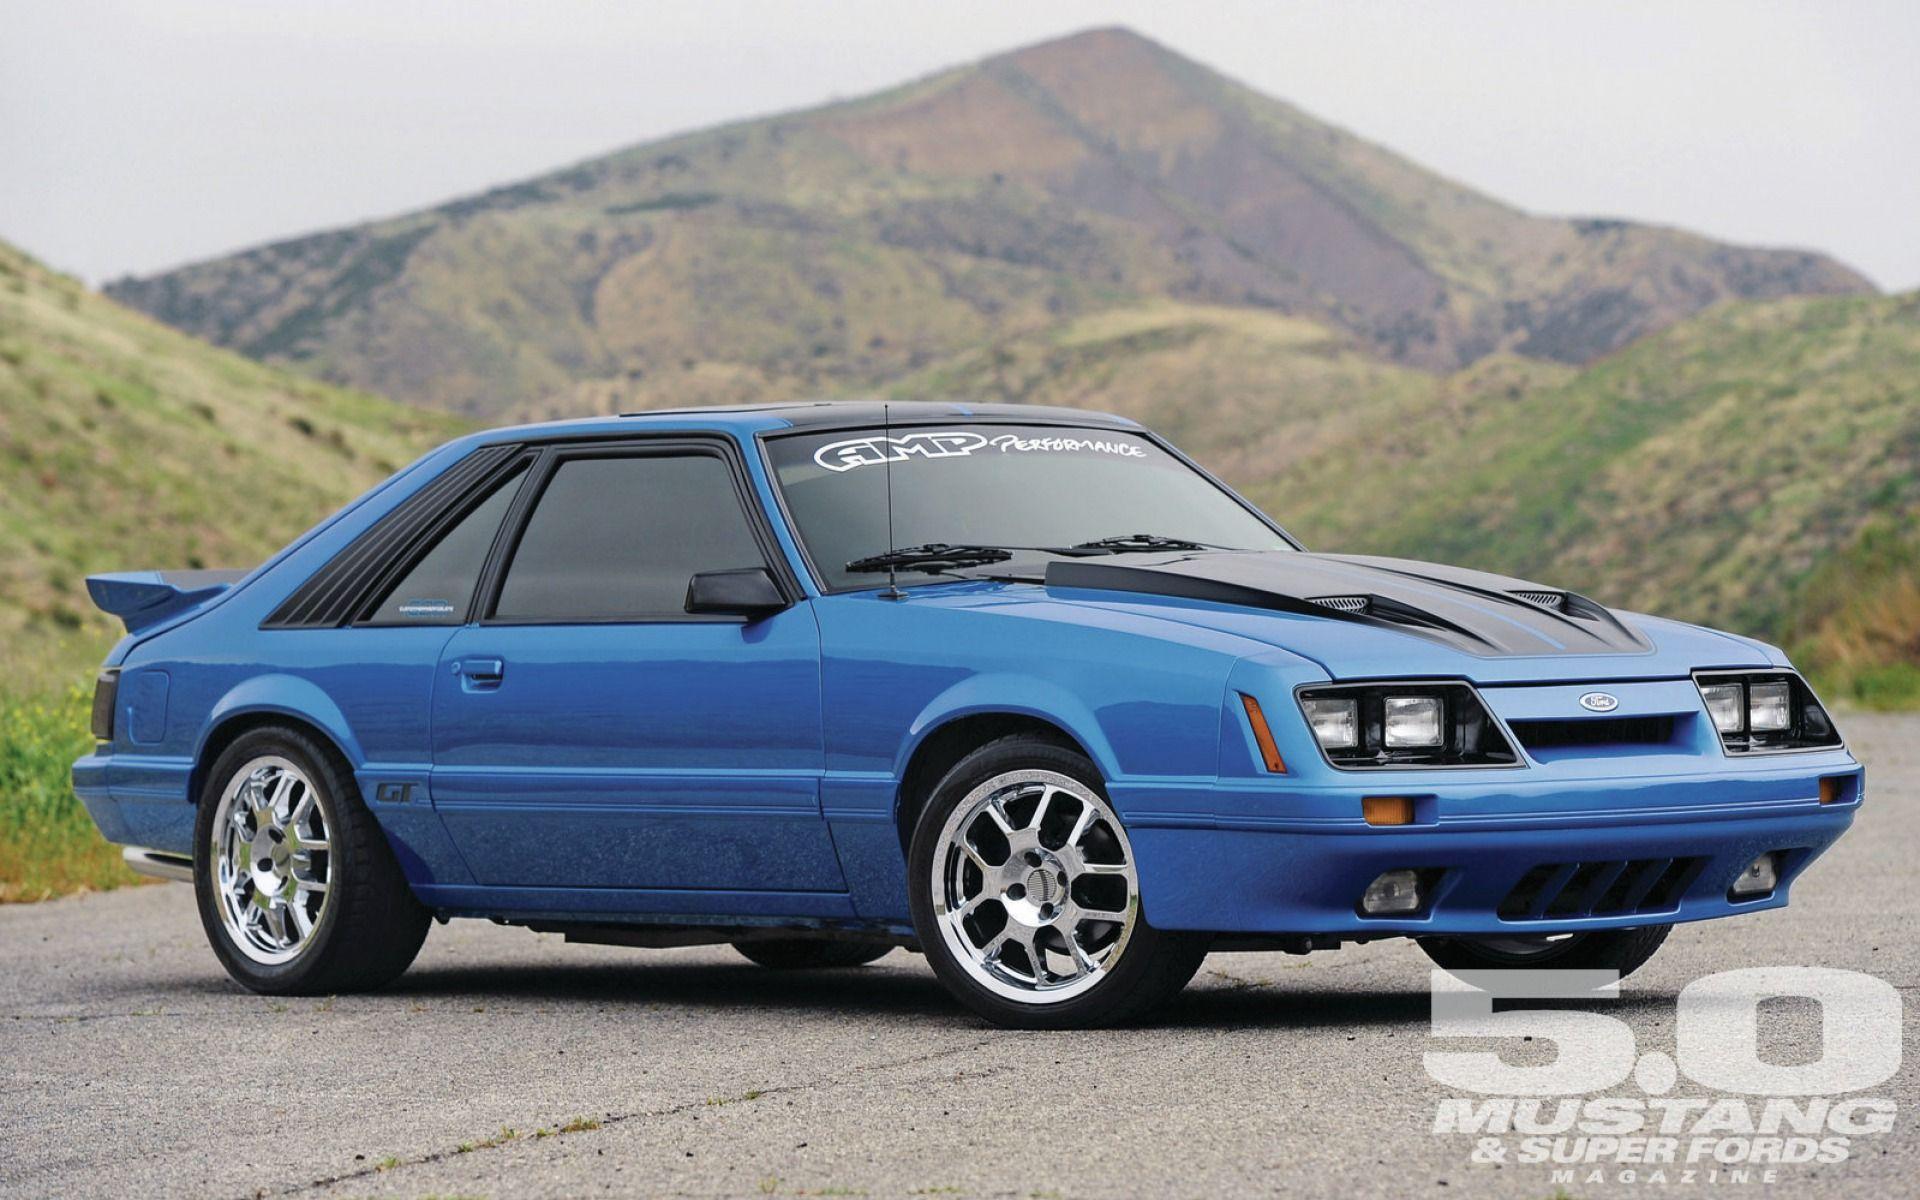 1986 ford mustang gt ford mustang azul llantas cromadas mustang club blue